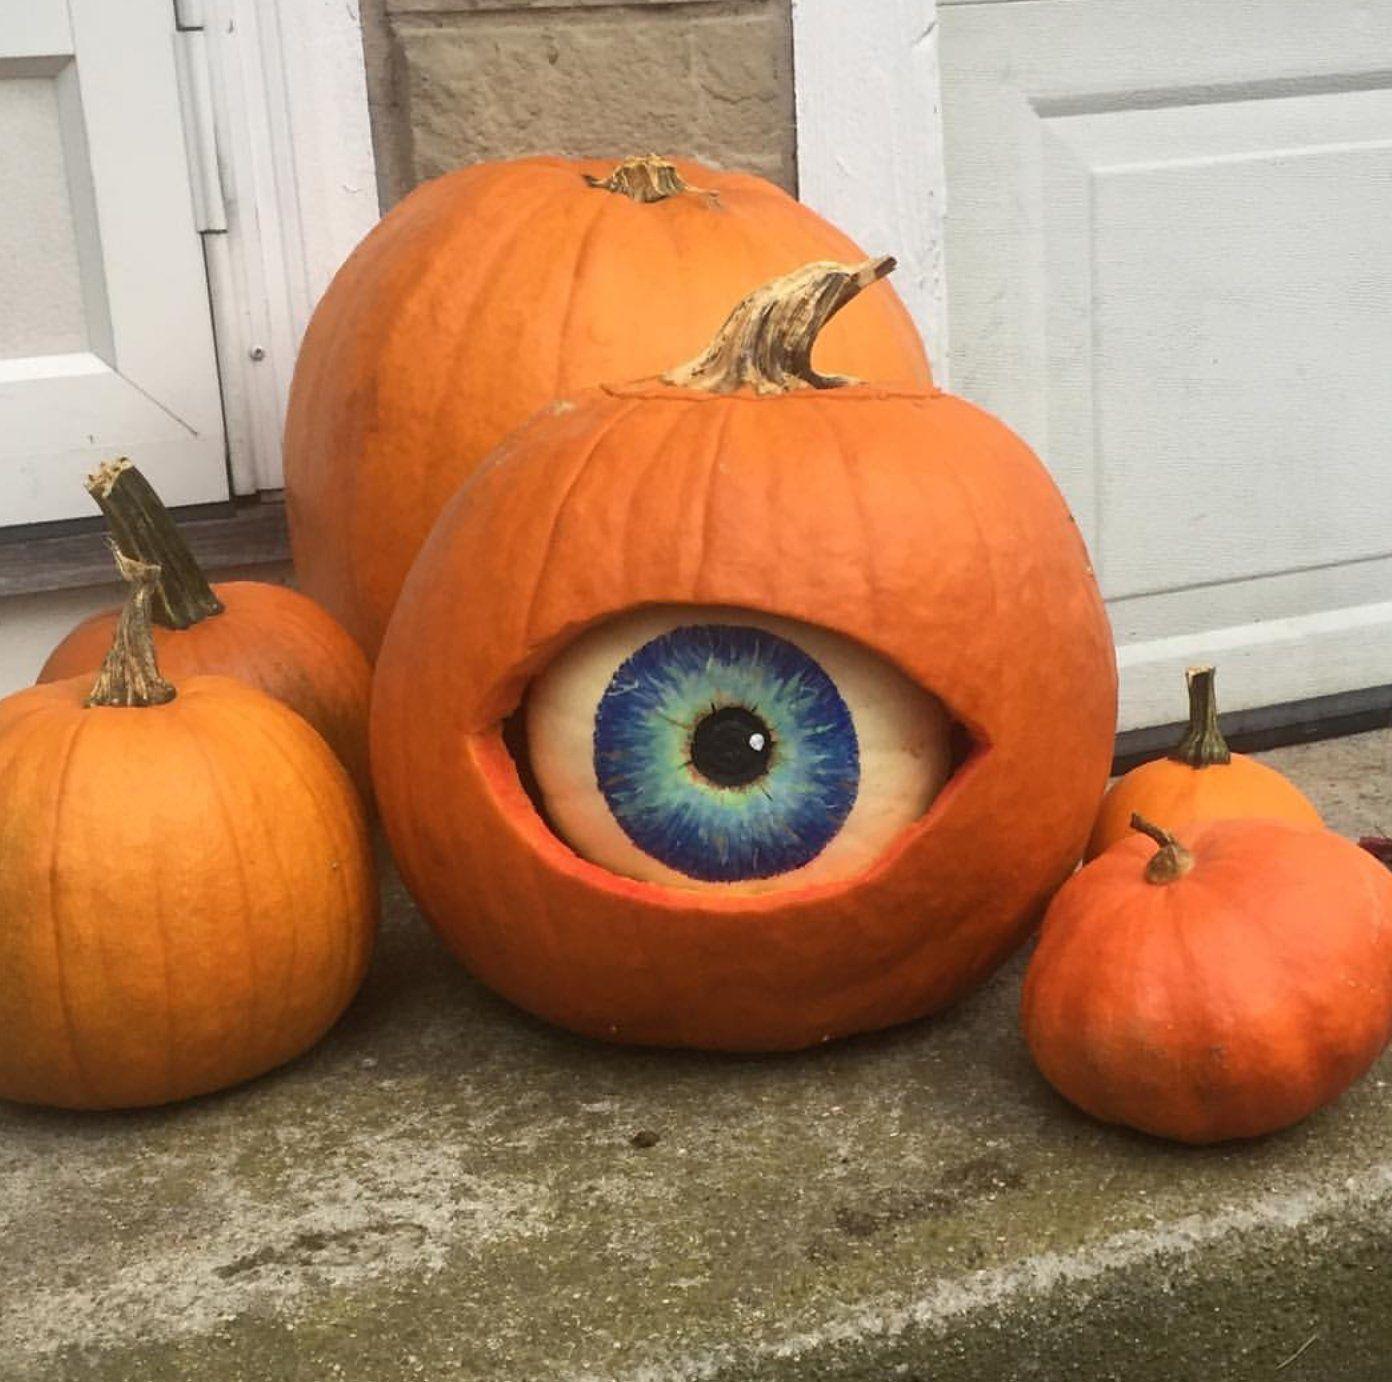 Flood On Twitter Kurbisschnitzereien Halloween Deko Basteln Kurbisse Schnitzen